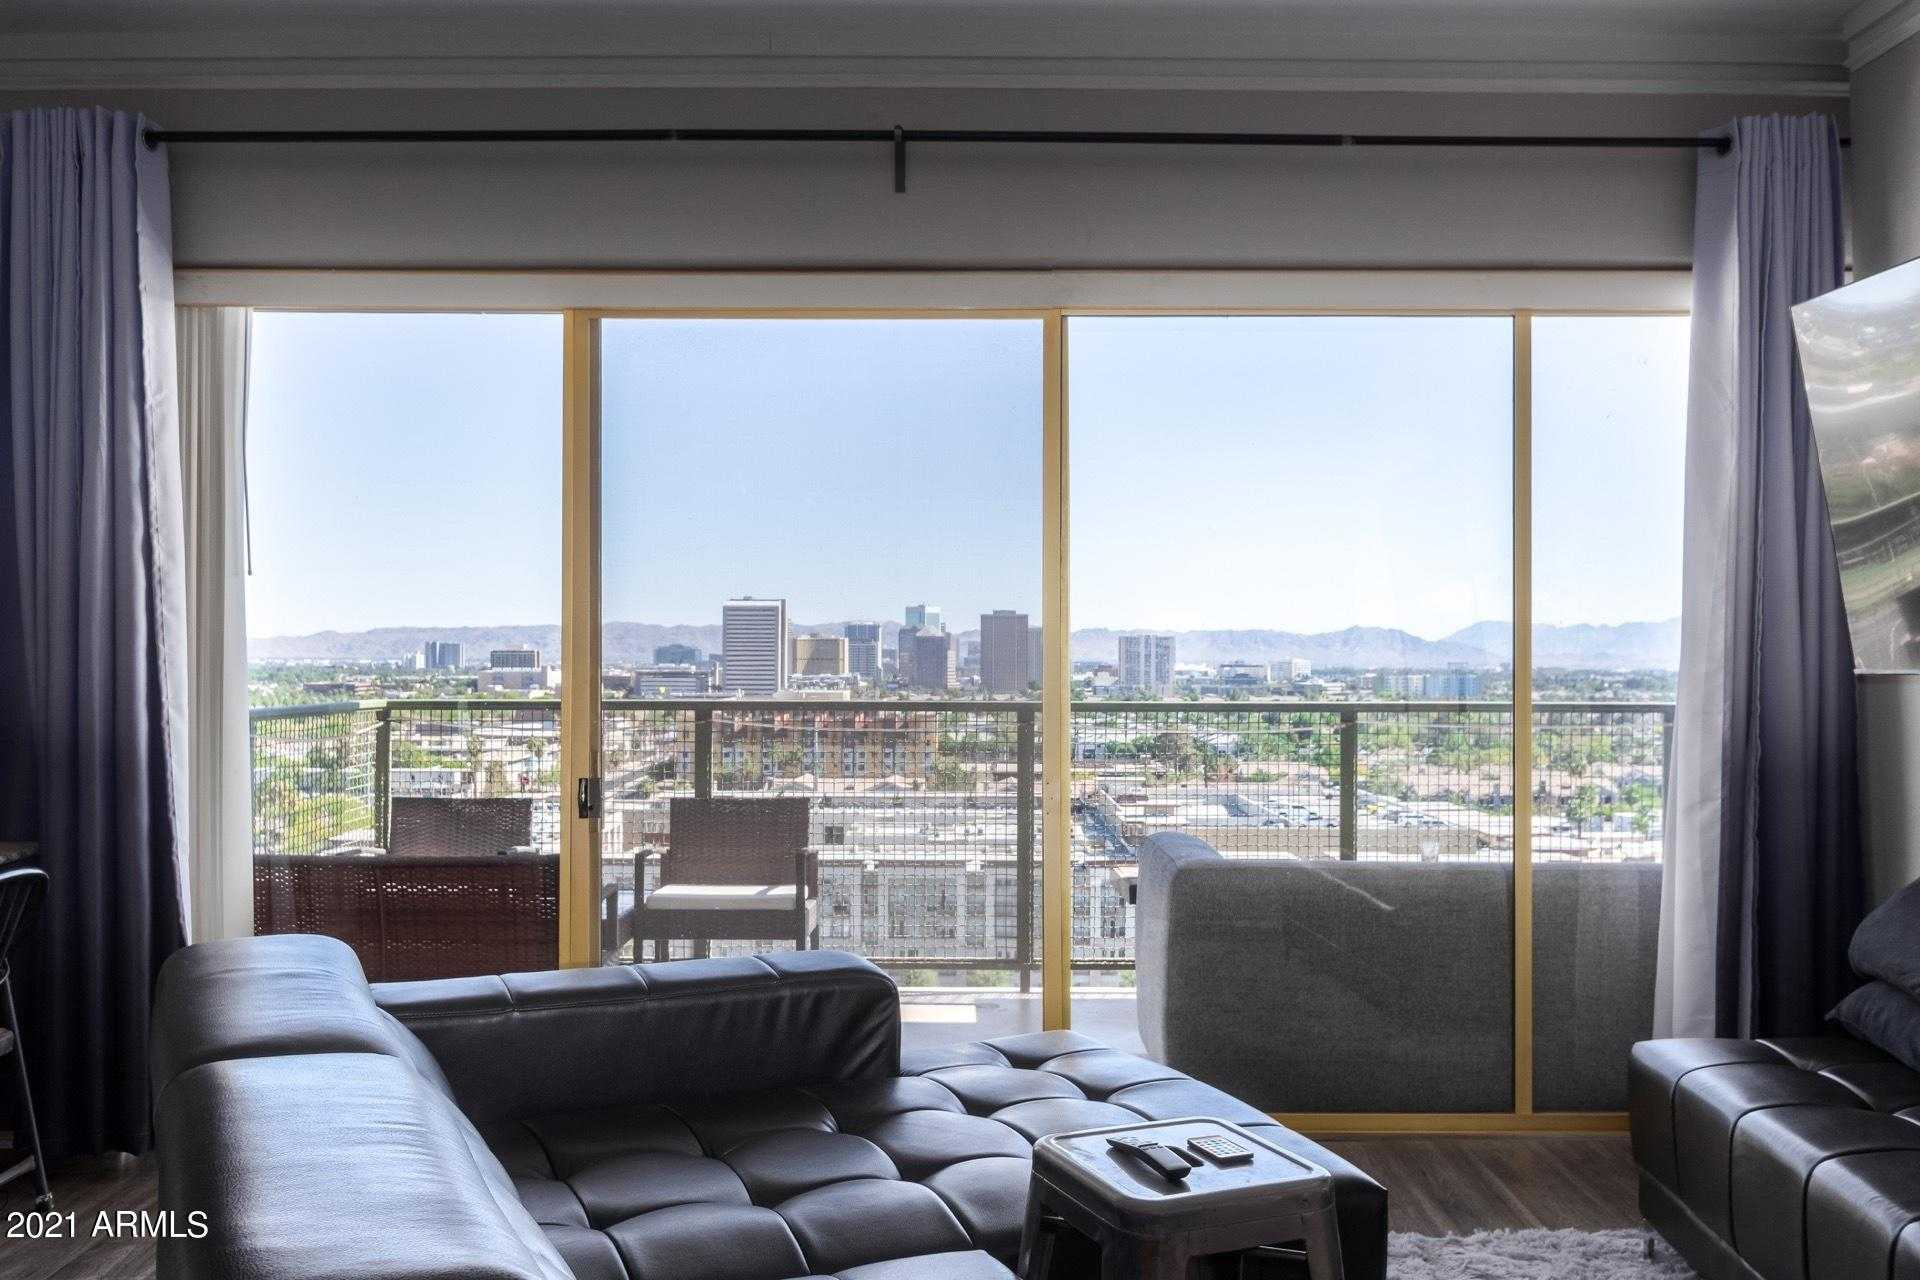 $160,000 - 1Br/1Ba -  for Sale in Landmark Towers Condominium, Phoenix